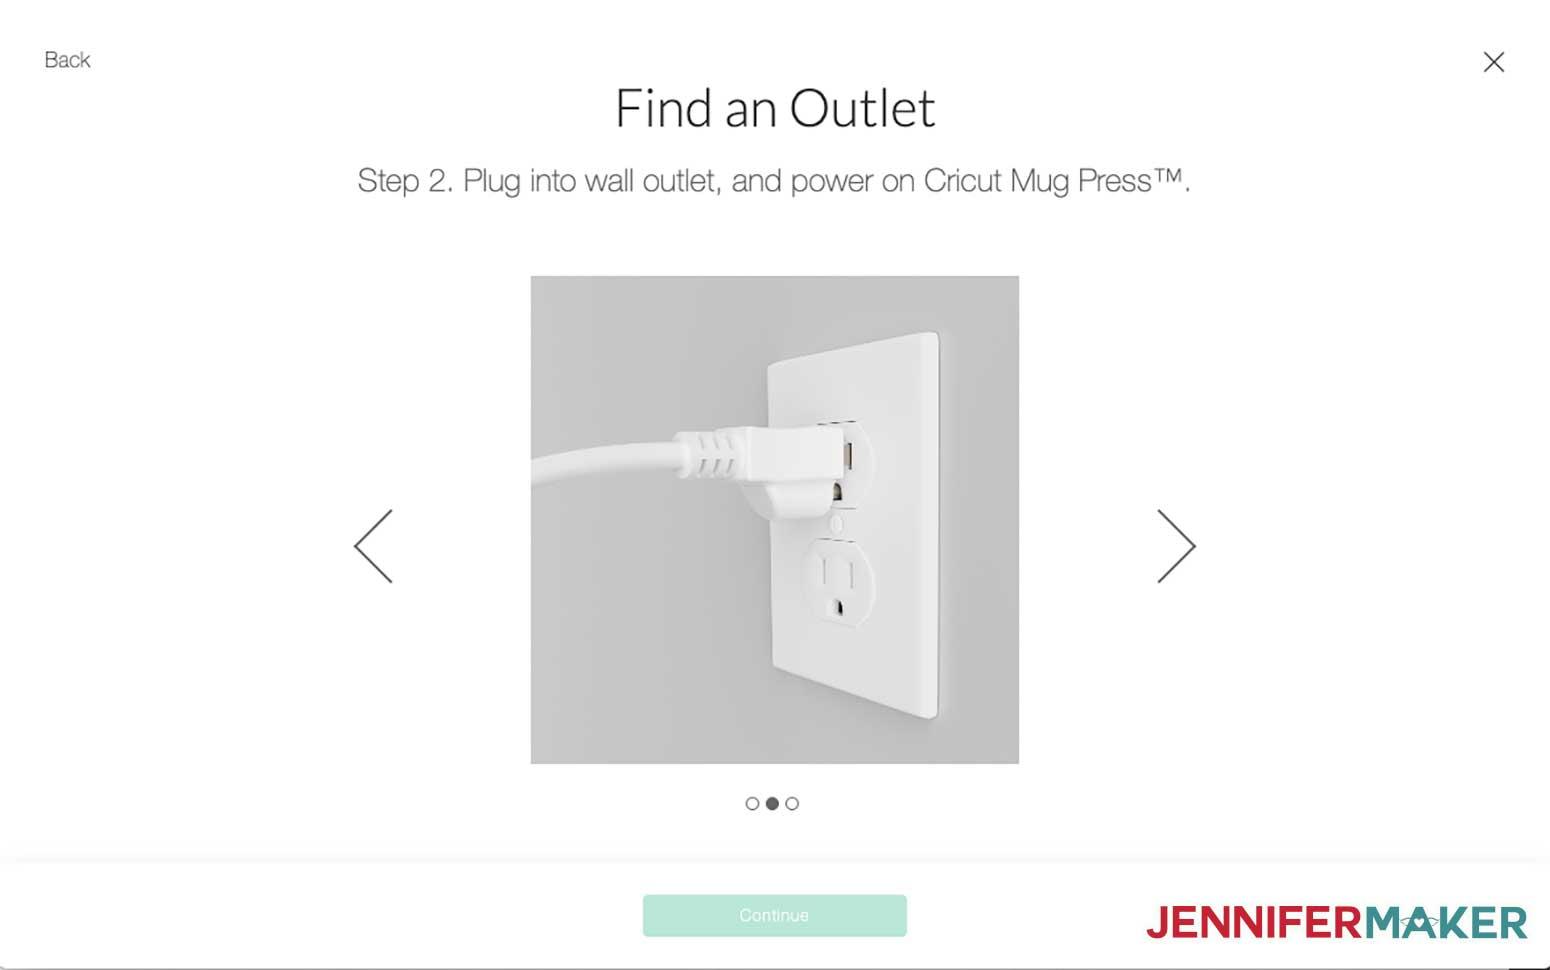 Cricut Mug Press plugged into a power outlet